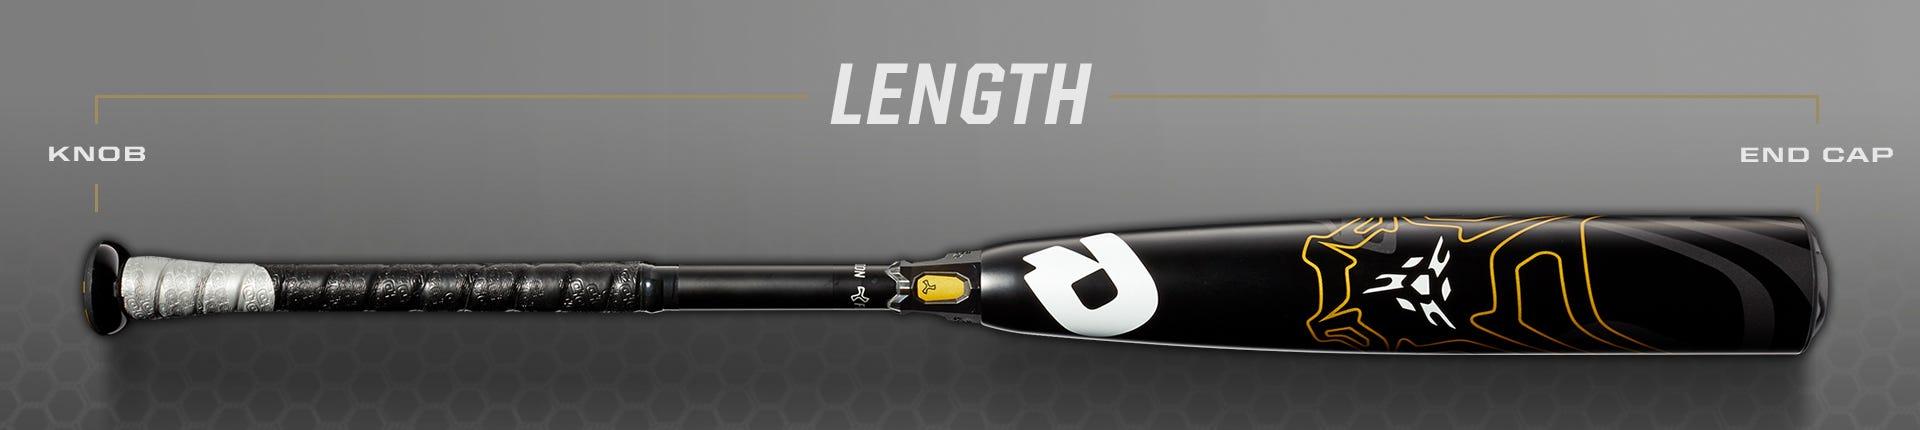 How To Choose a Baseball Bat | DeMarini